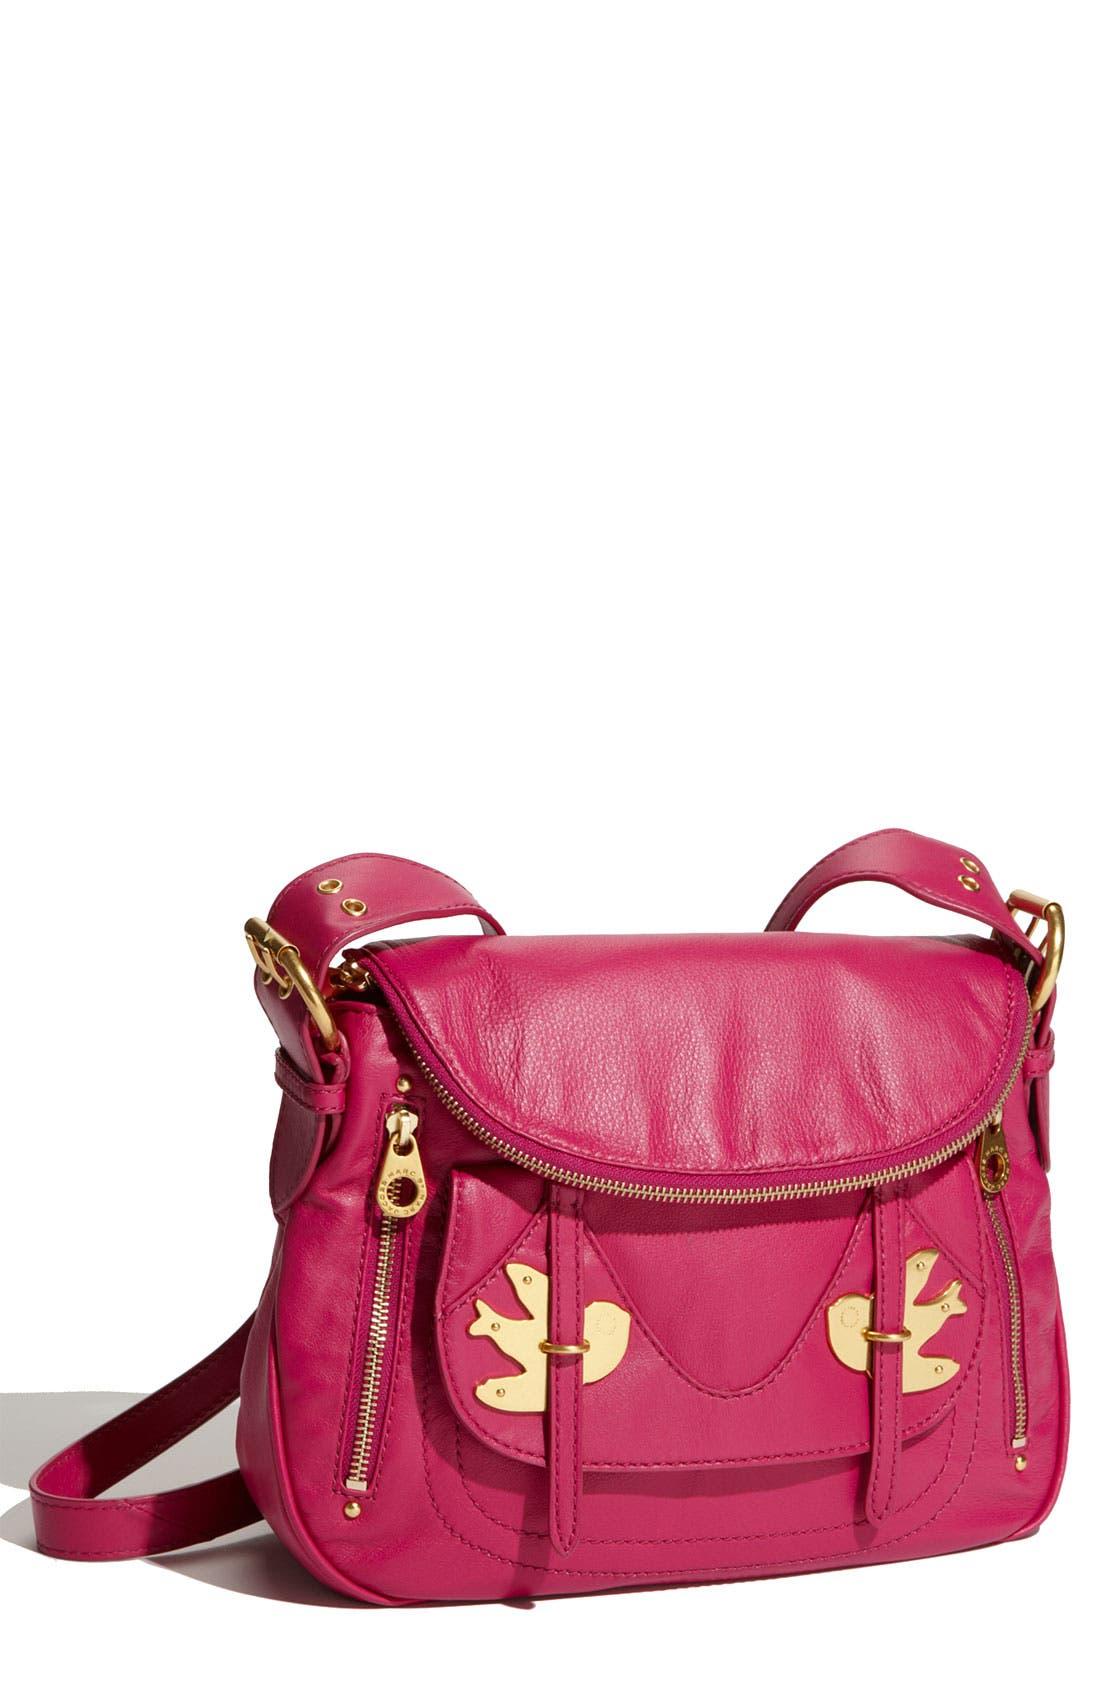 ,                             MARC BY MARC JACOBS 'Petal to the Metal - Natasha' Flap Crossbody Bag, Medium,                             Main thumbnail 41, color,                             650